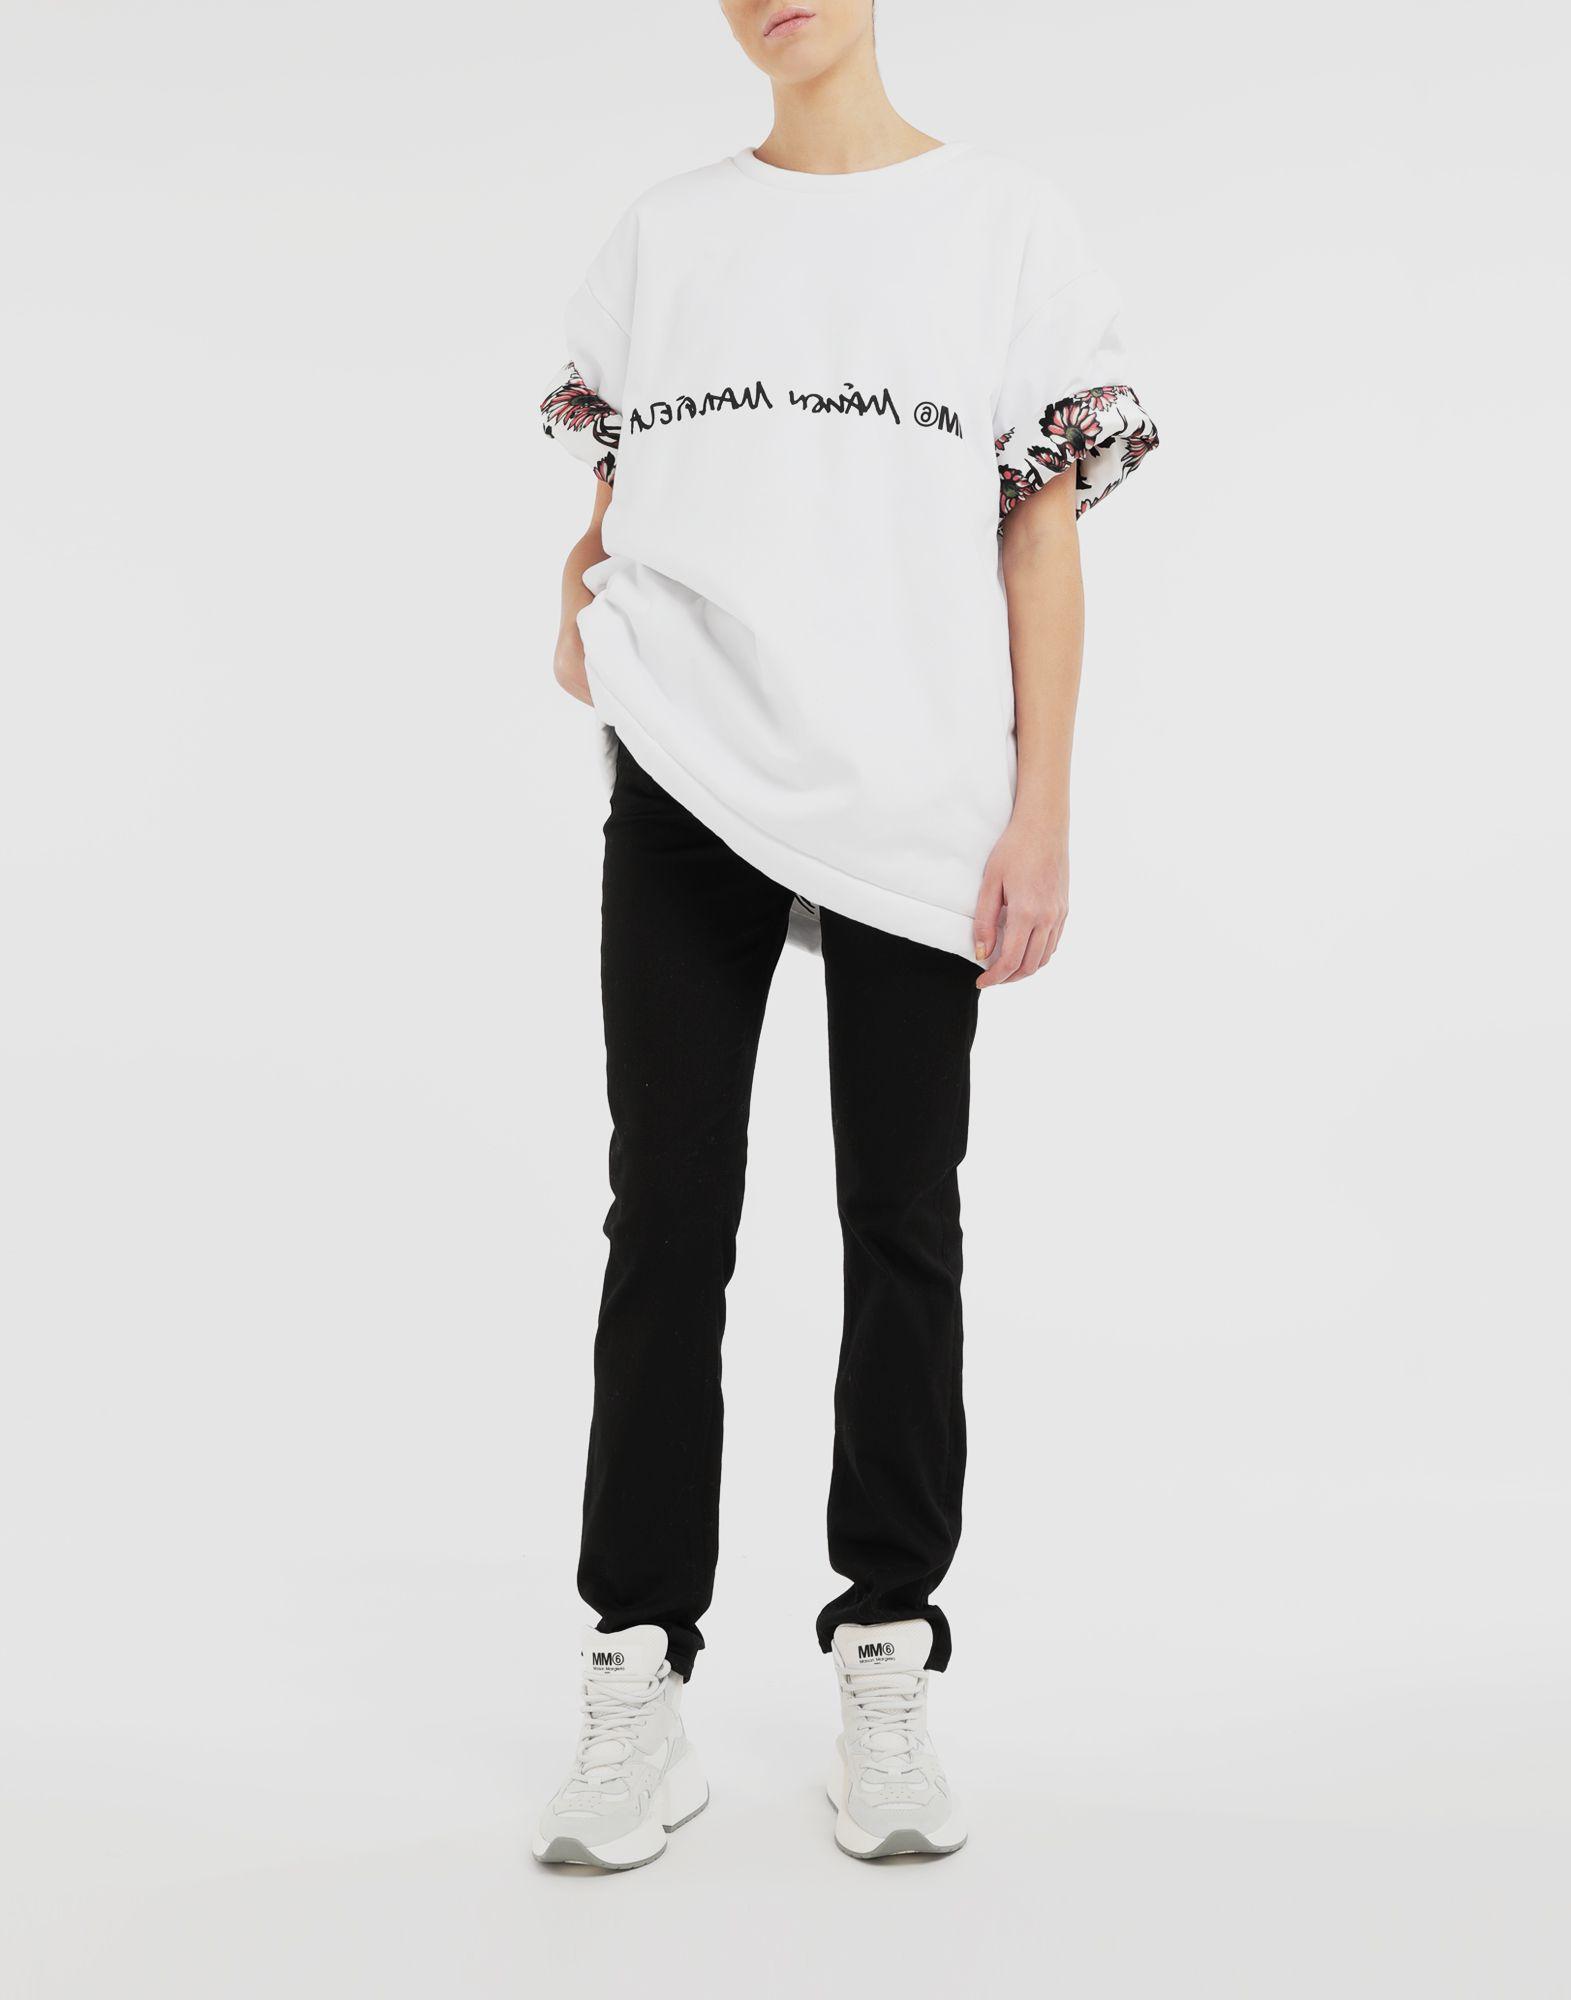 MM6 MAISON MARGIELA Camiseta con logotipo invertido Camiseta de manga corta Mujer d